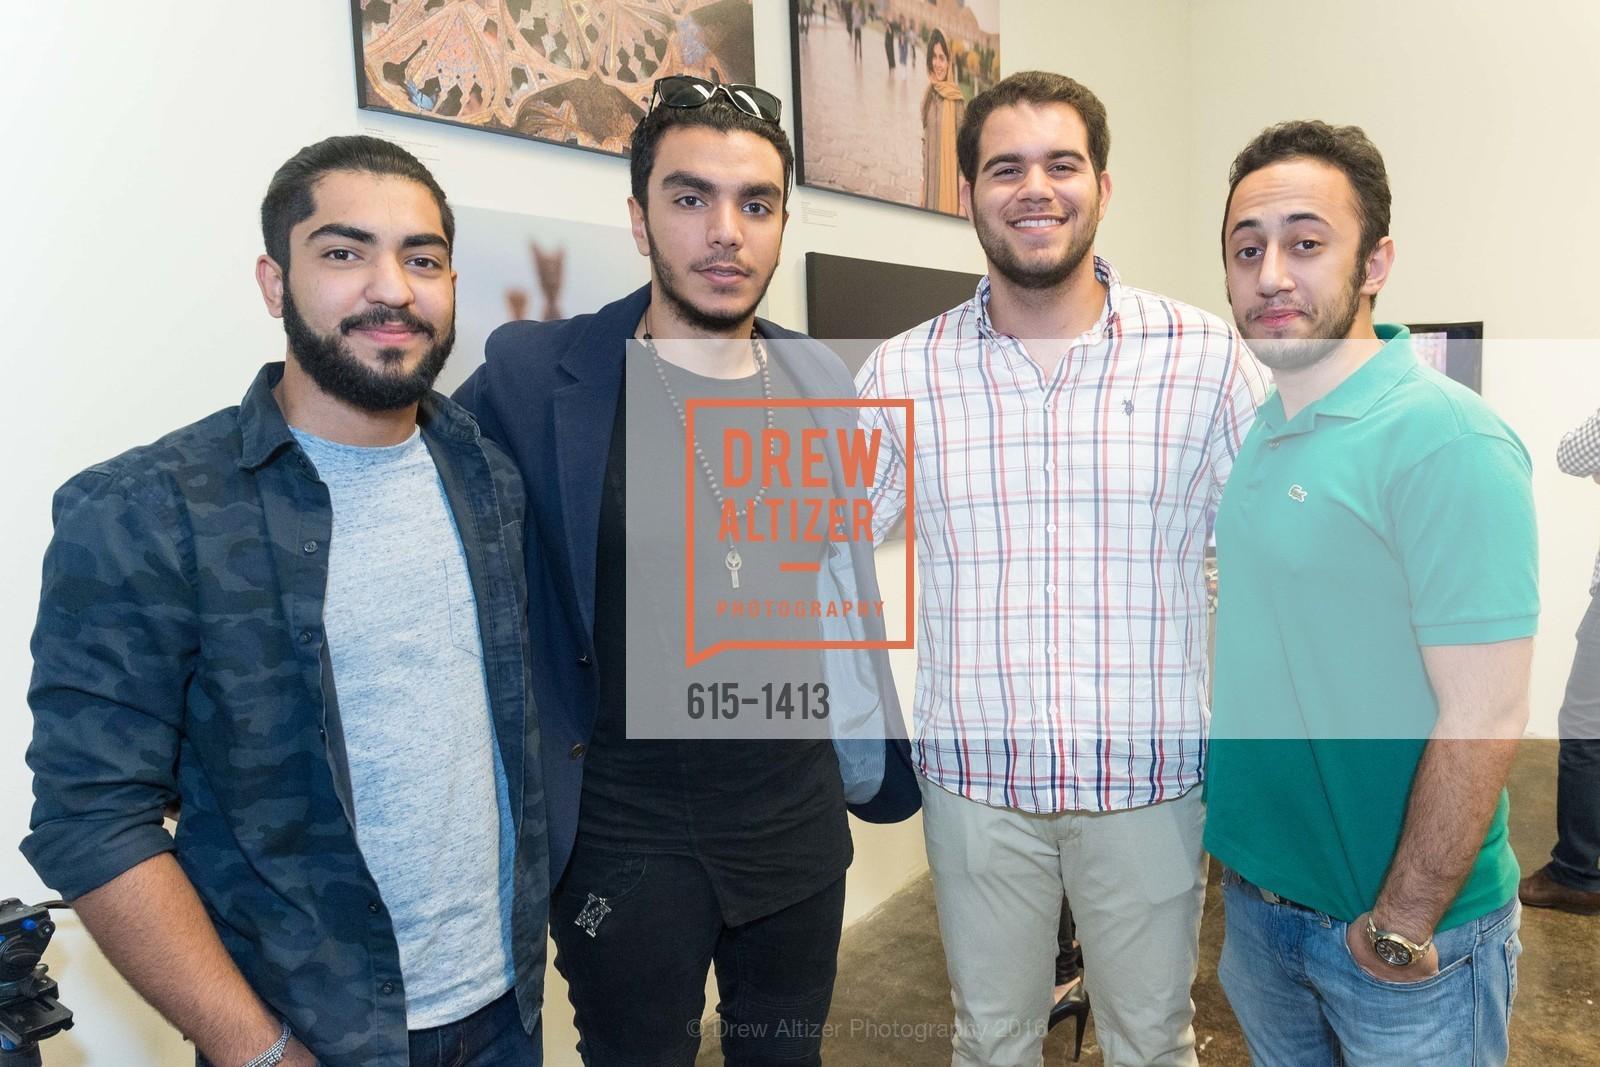 Mahbod Rahmaifar, Amir Mahdavian, Daniel Abar, Shayan Askarian, Photo #615-1413